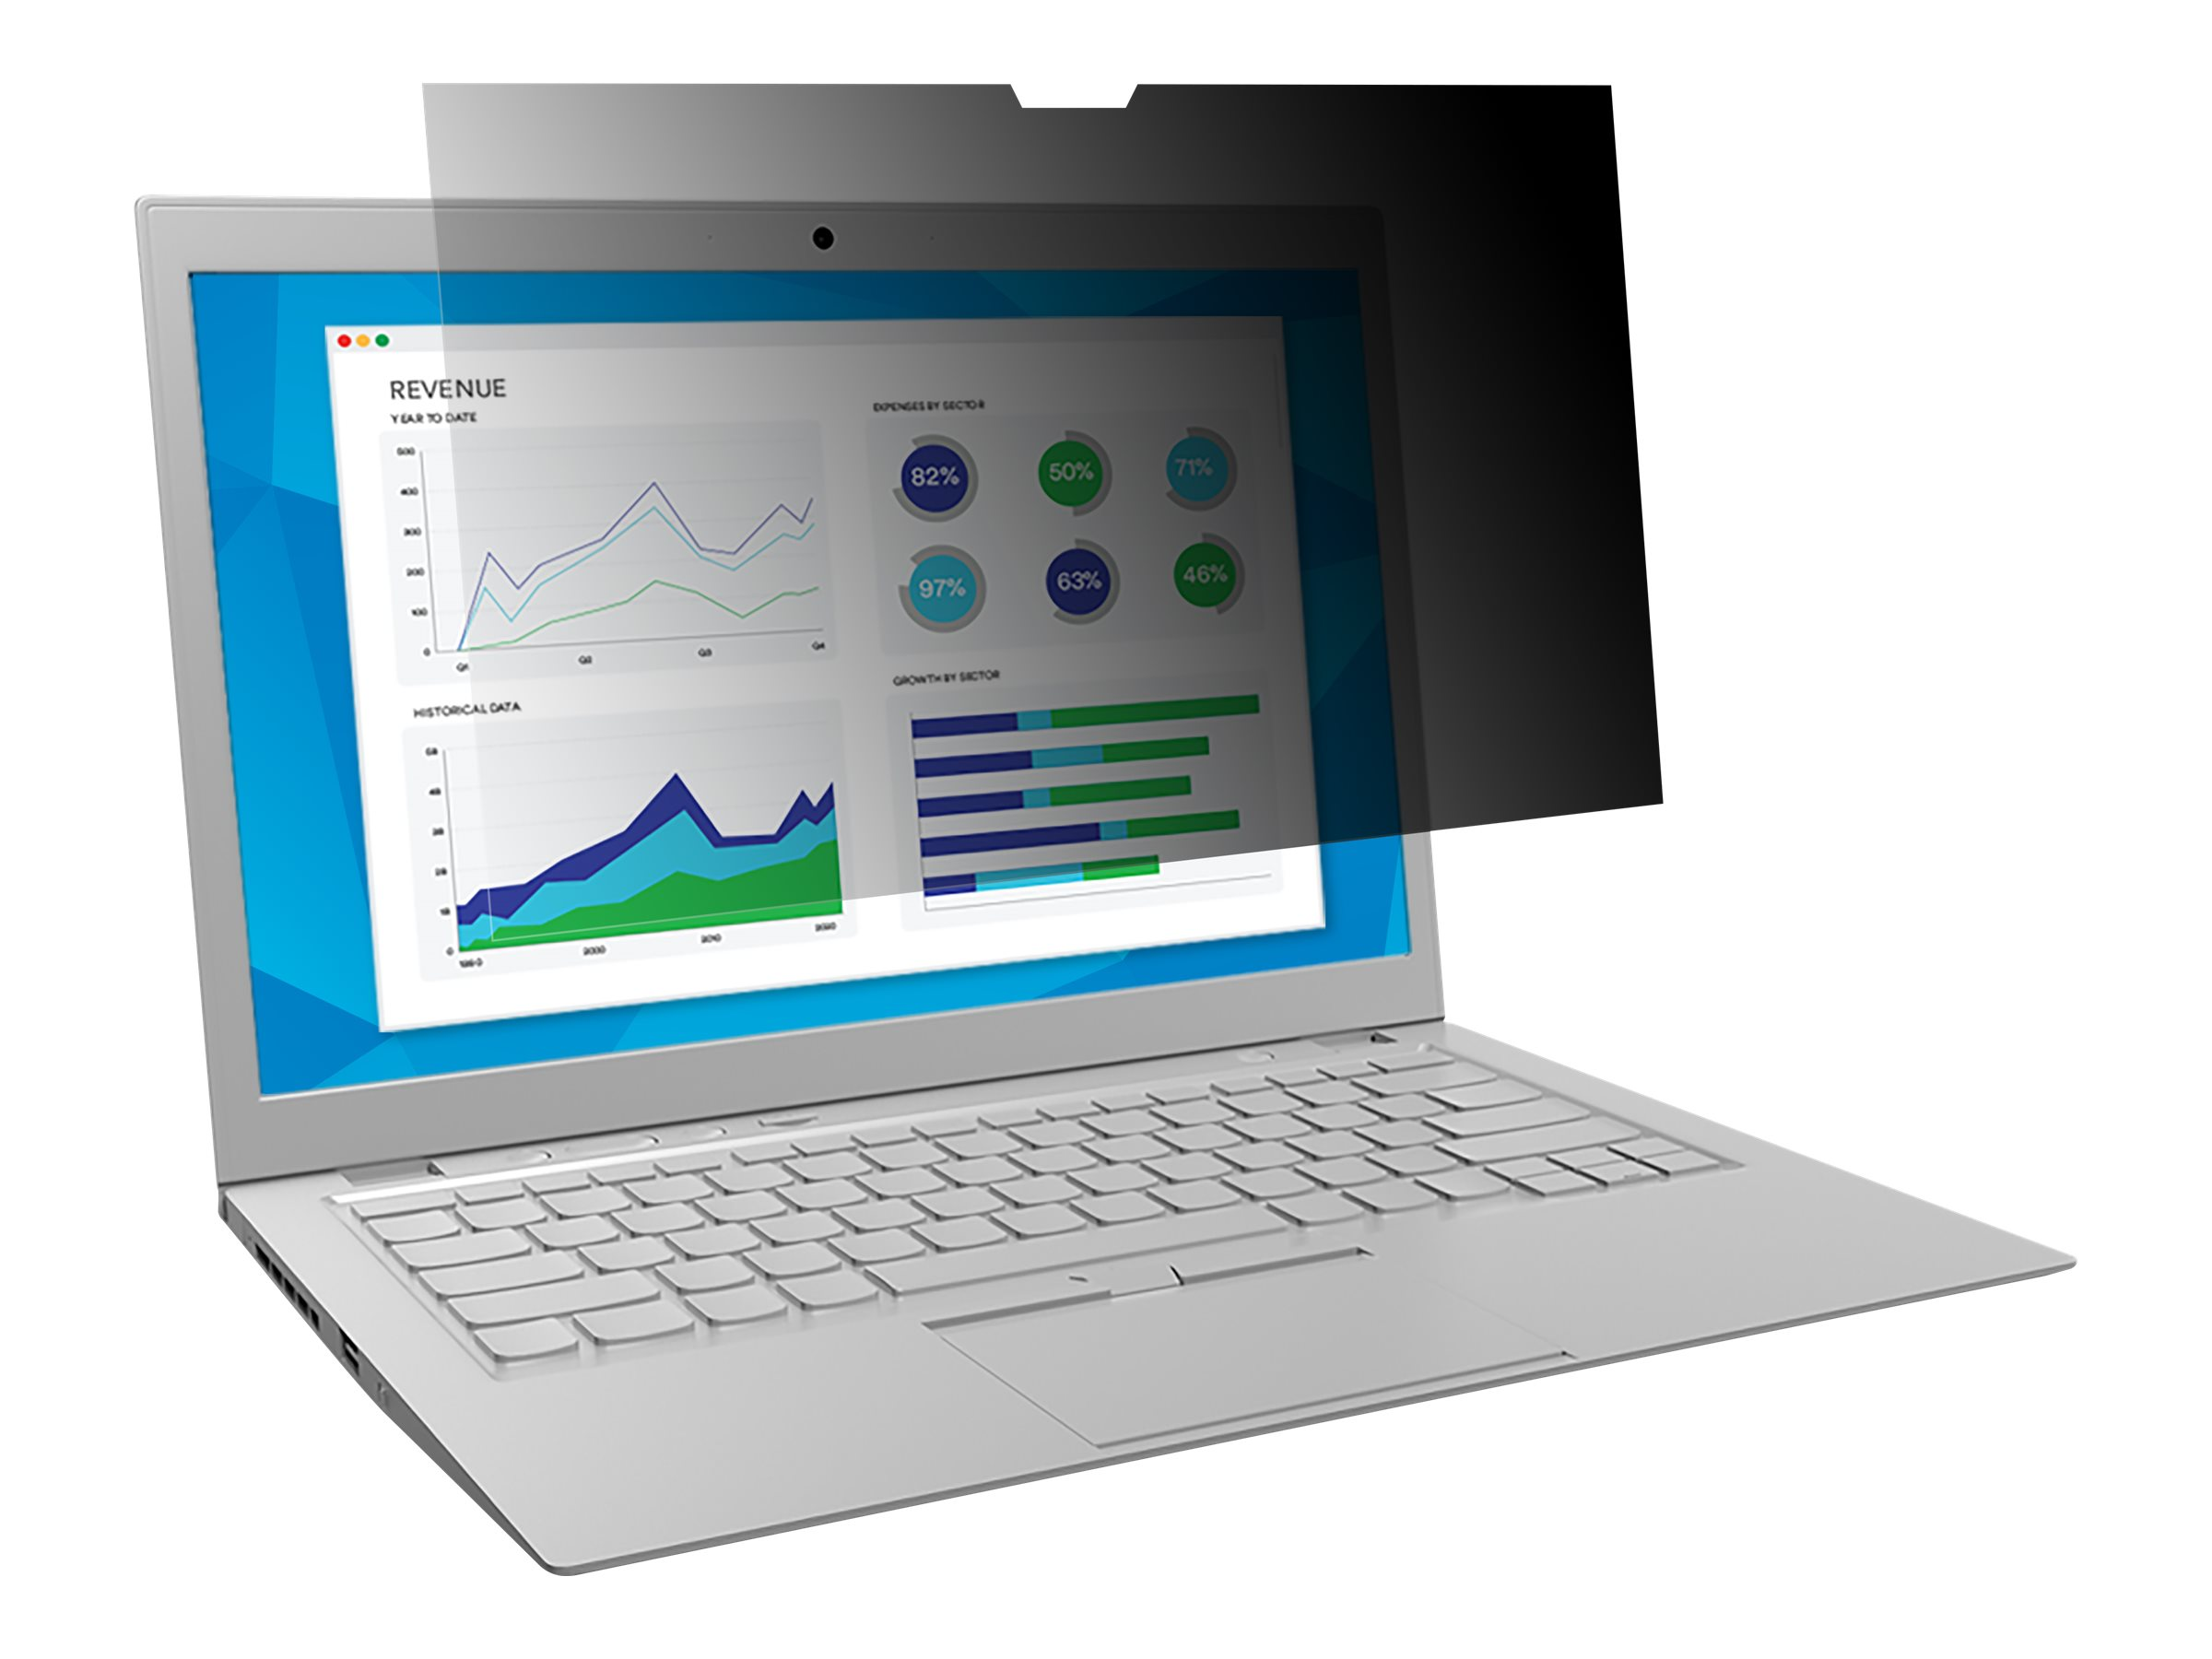 3M Blickschutzfilter for HP EliteBook x360 1030 G2 with COMPLY Attachment System - Blickschutzfilter für Notebook - 33,8 cm Breitbild (13,3 Zoll Breitbild)